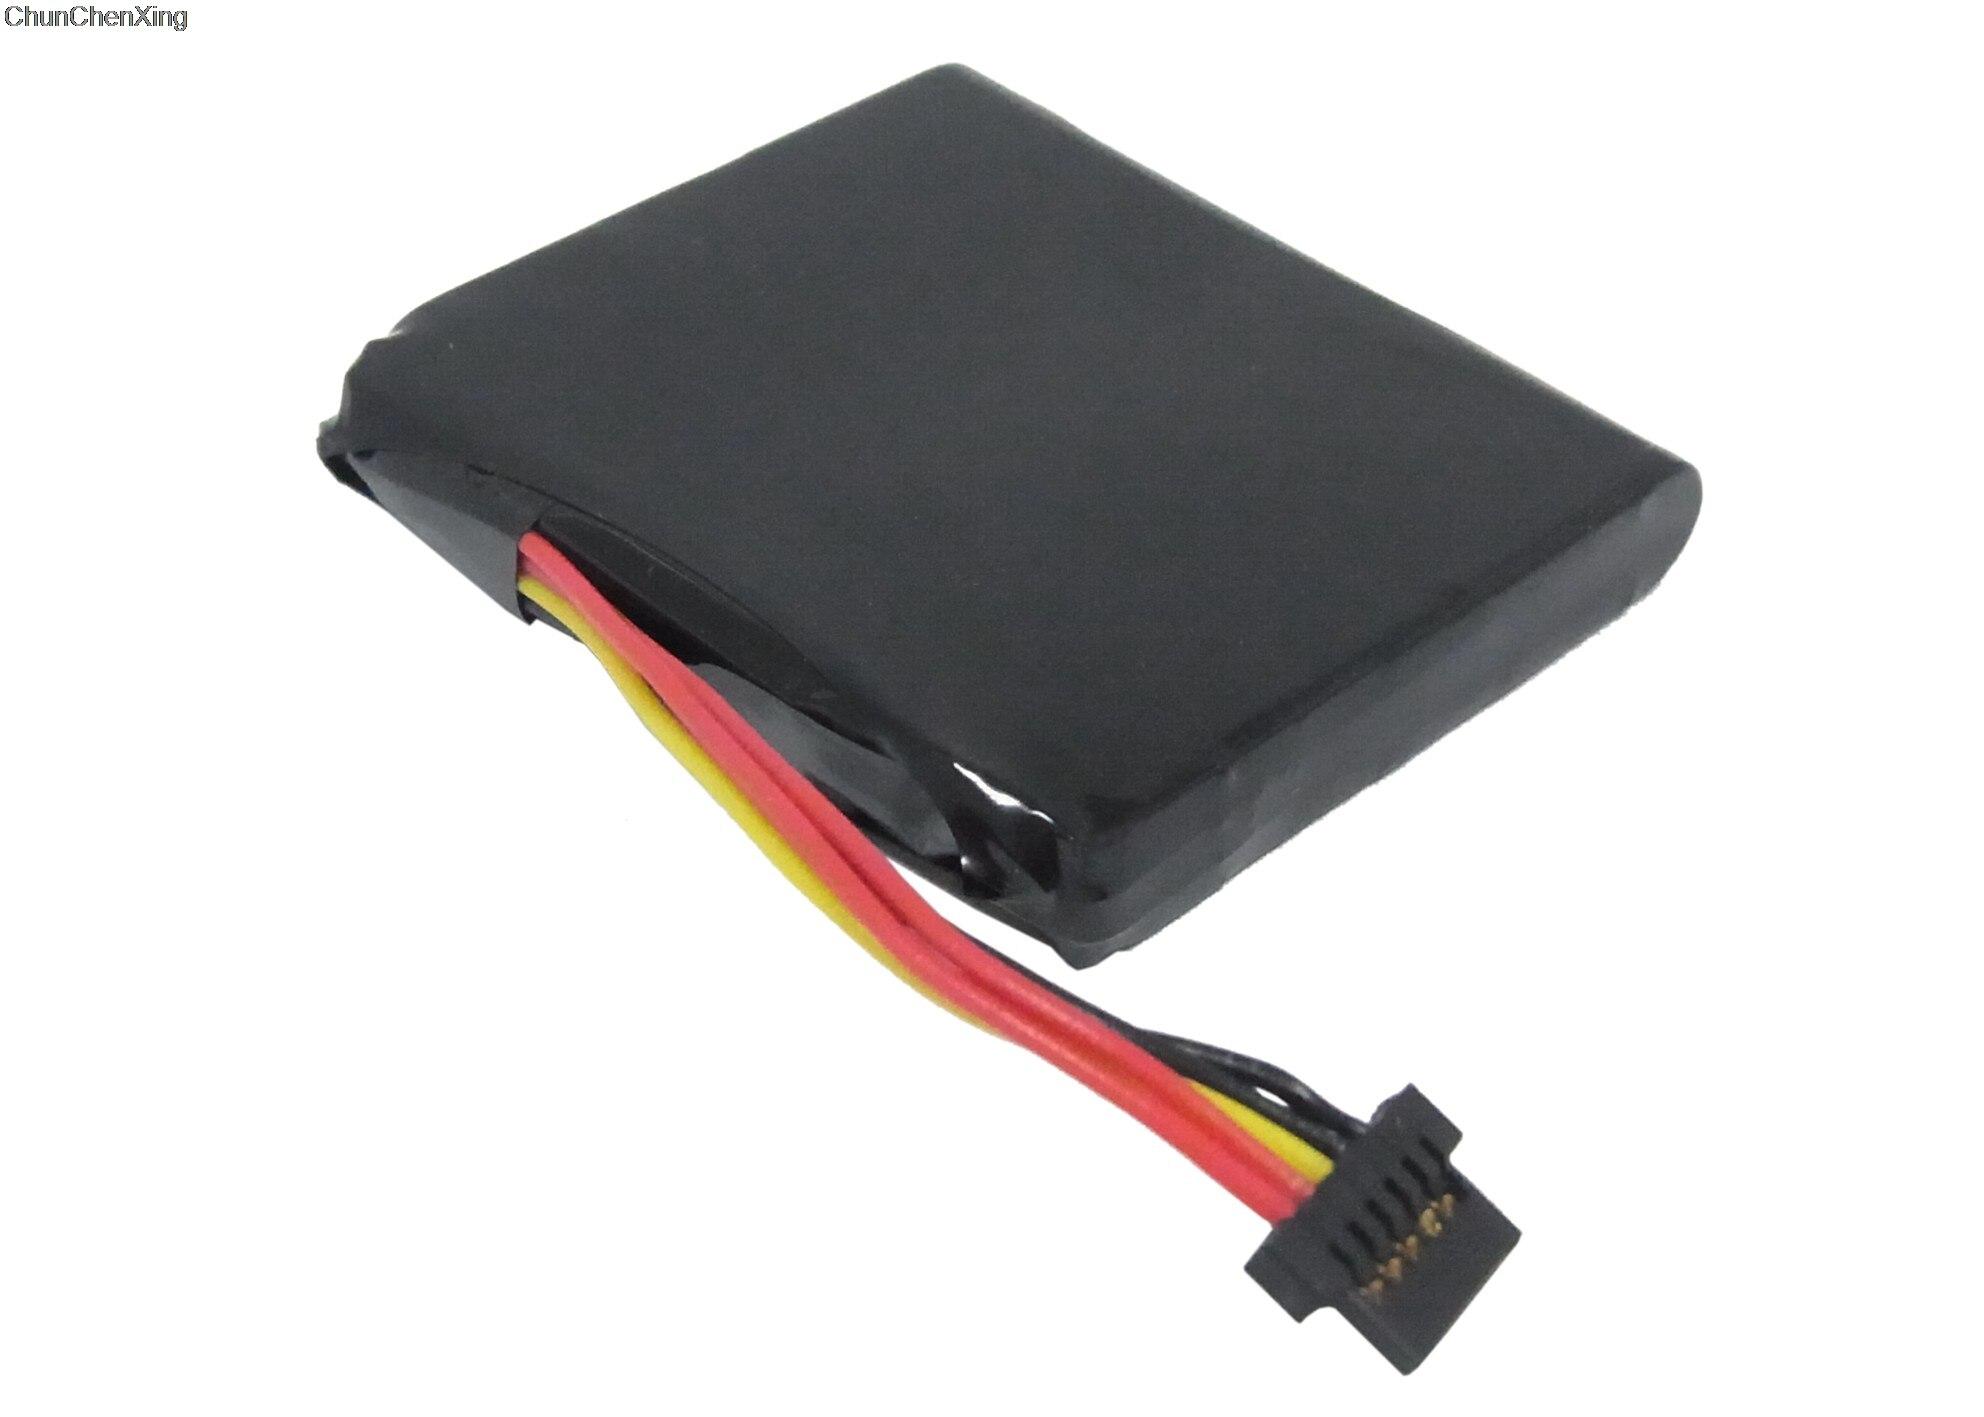 Batería para TomTom tipo vf1c 3,7v 1000mah//3 7wh Li-ion negro